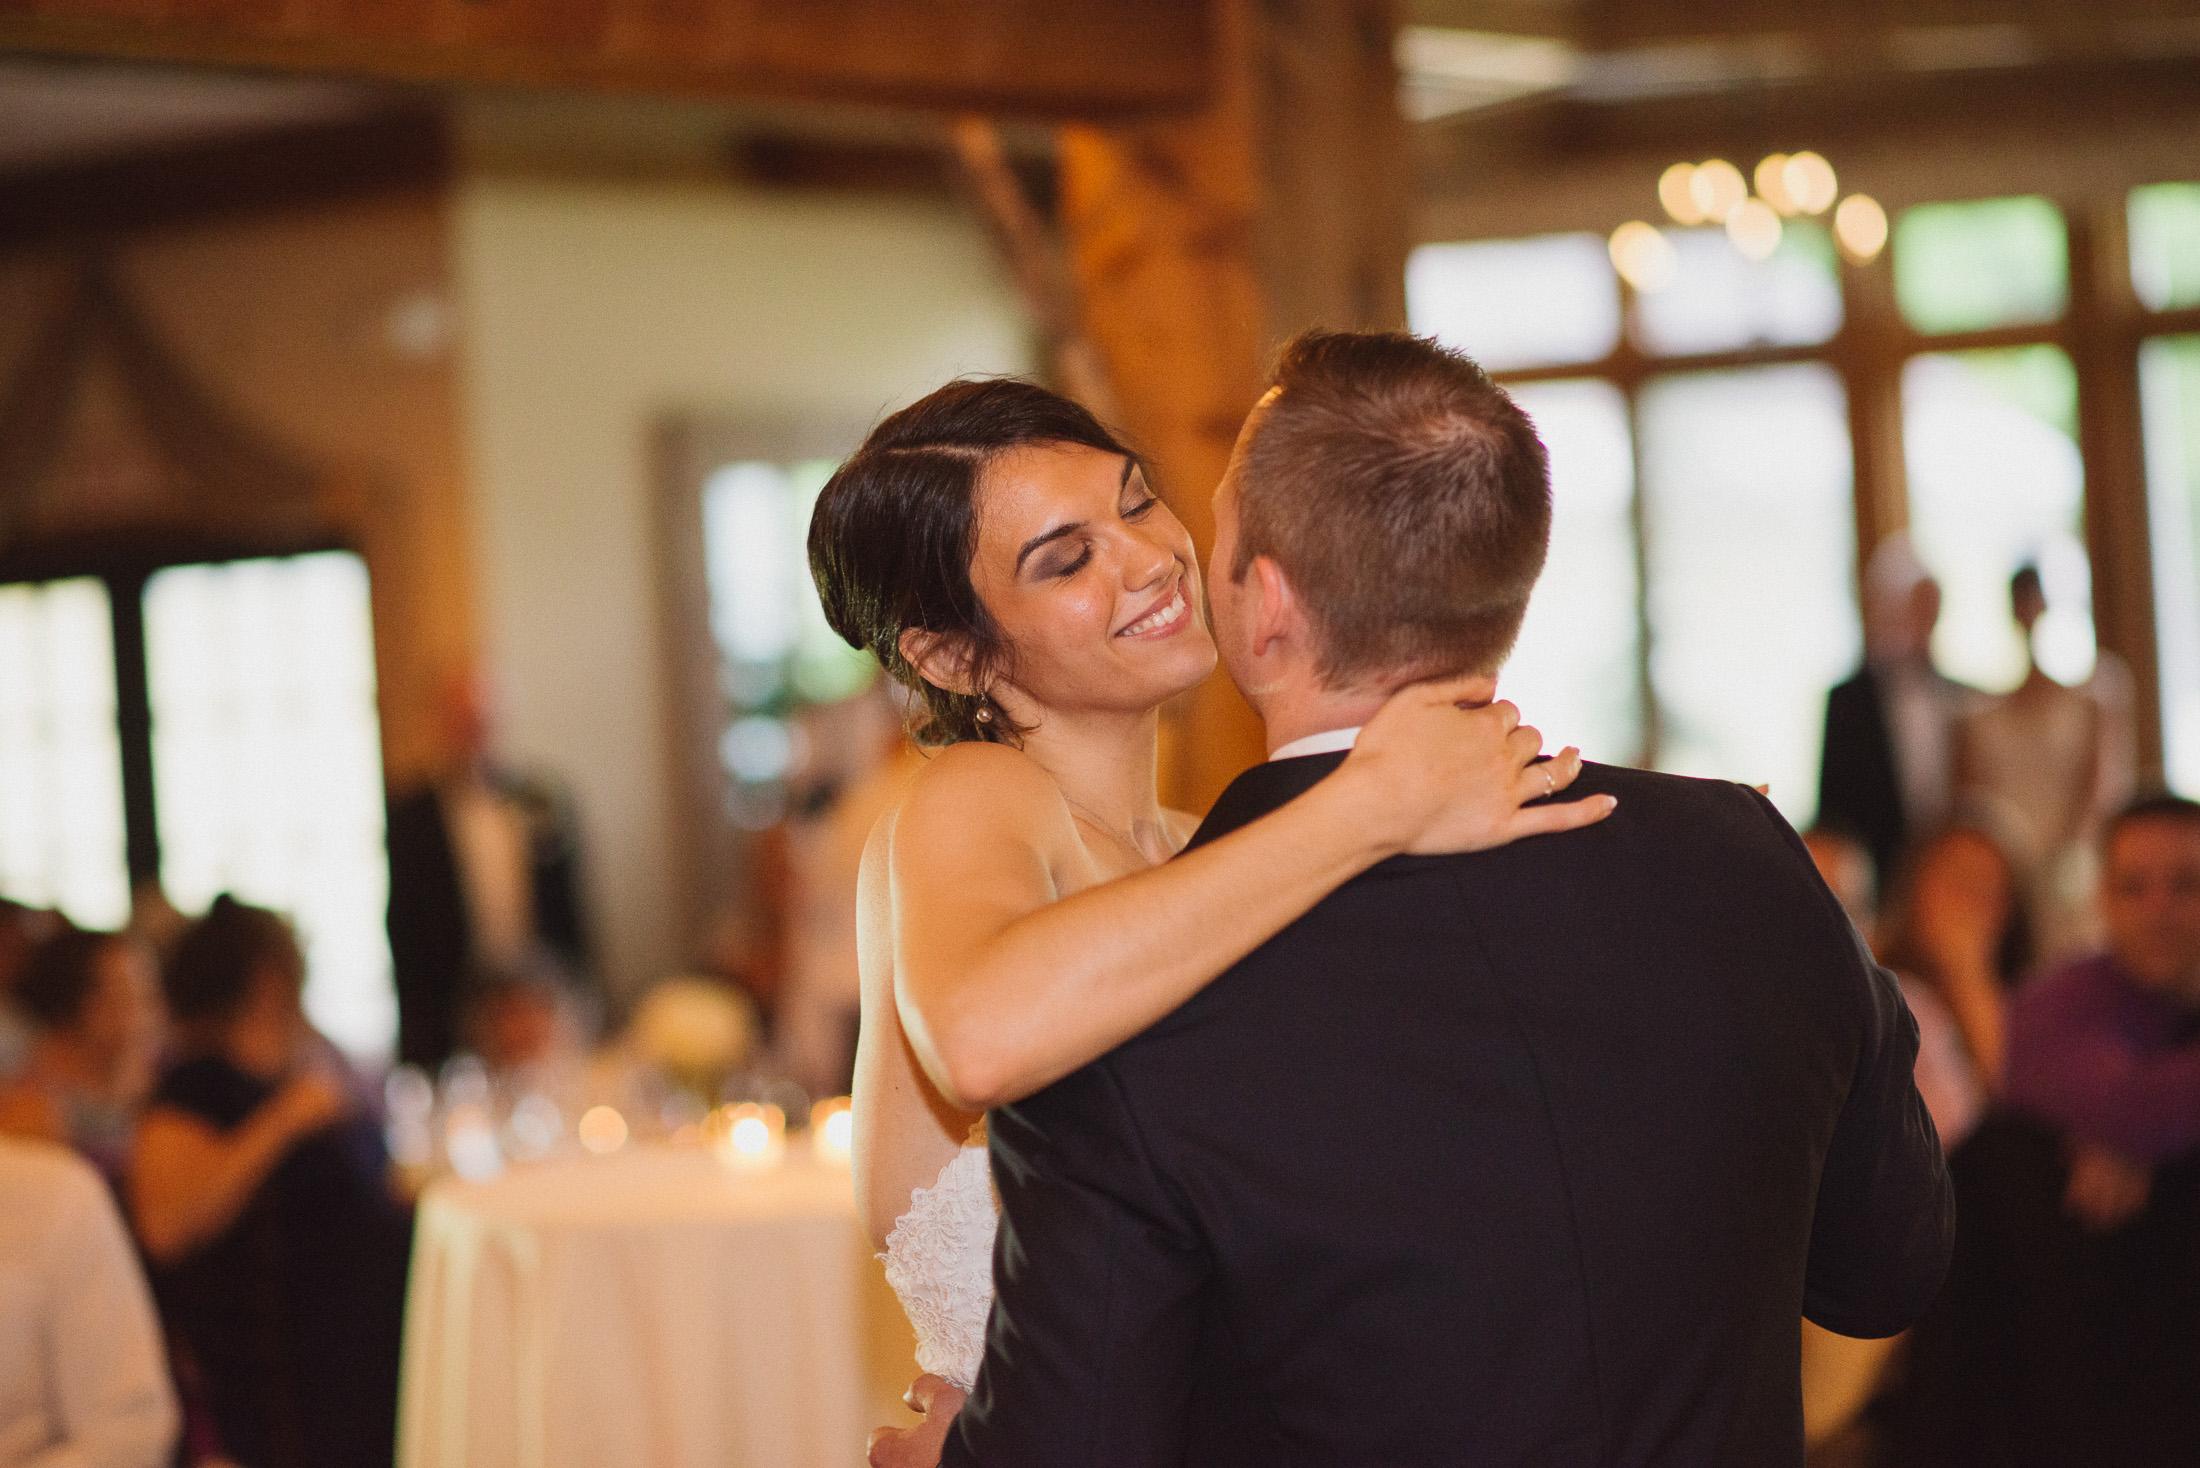 NH Wedding Photographer: couple's first dance